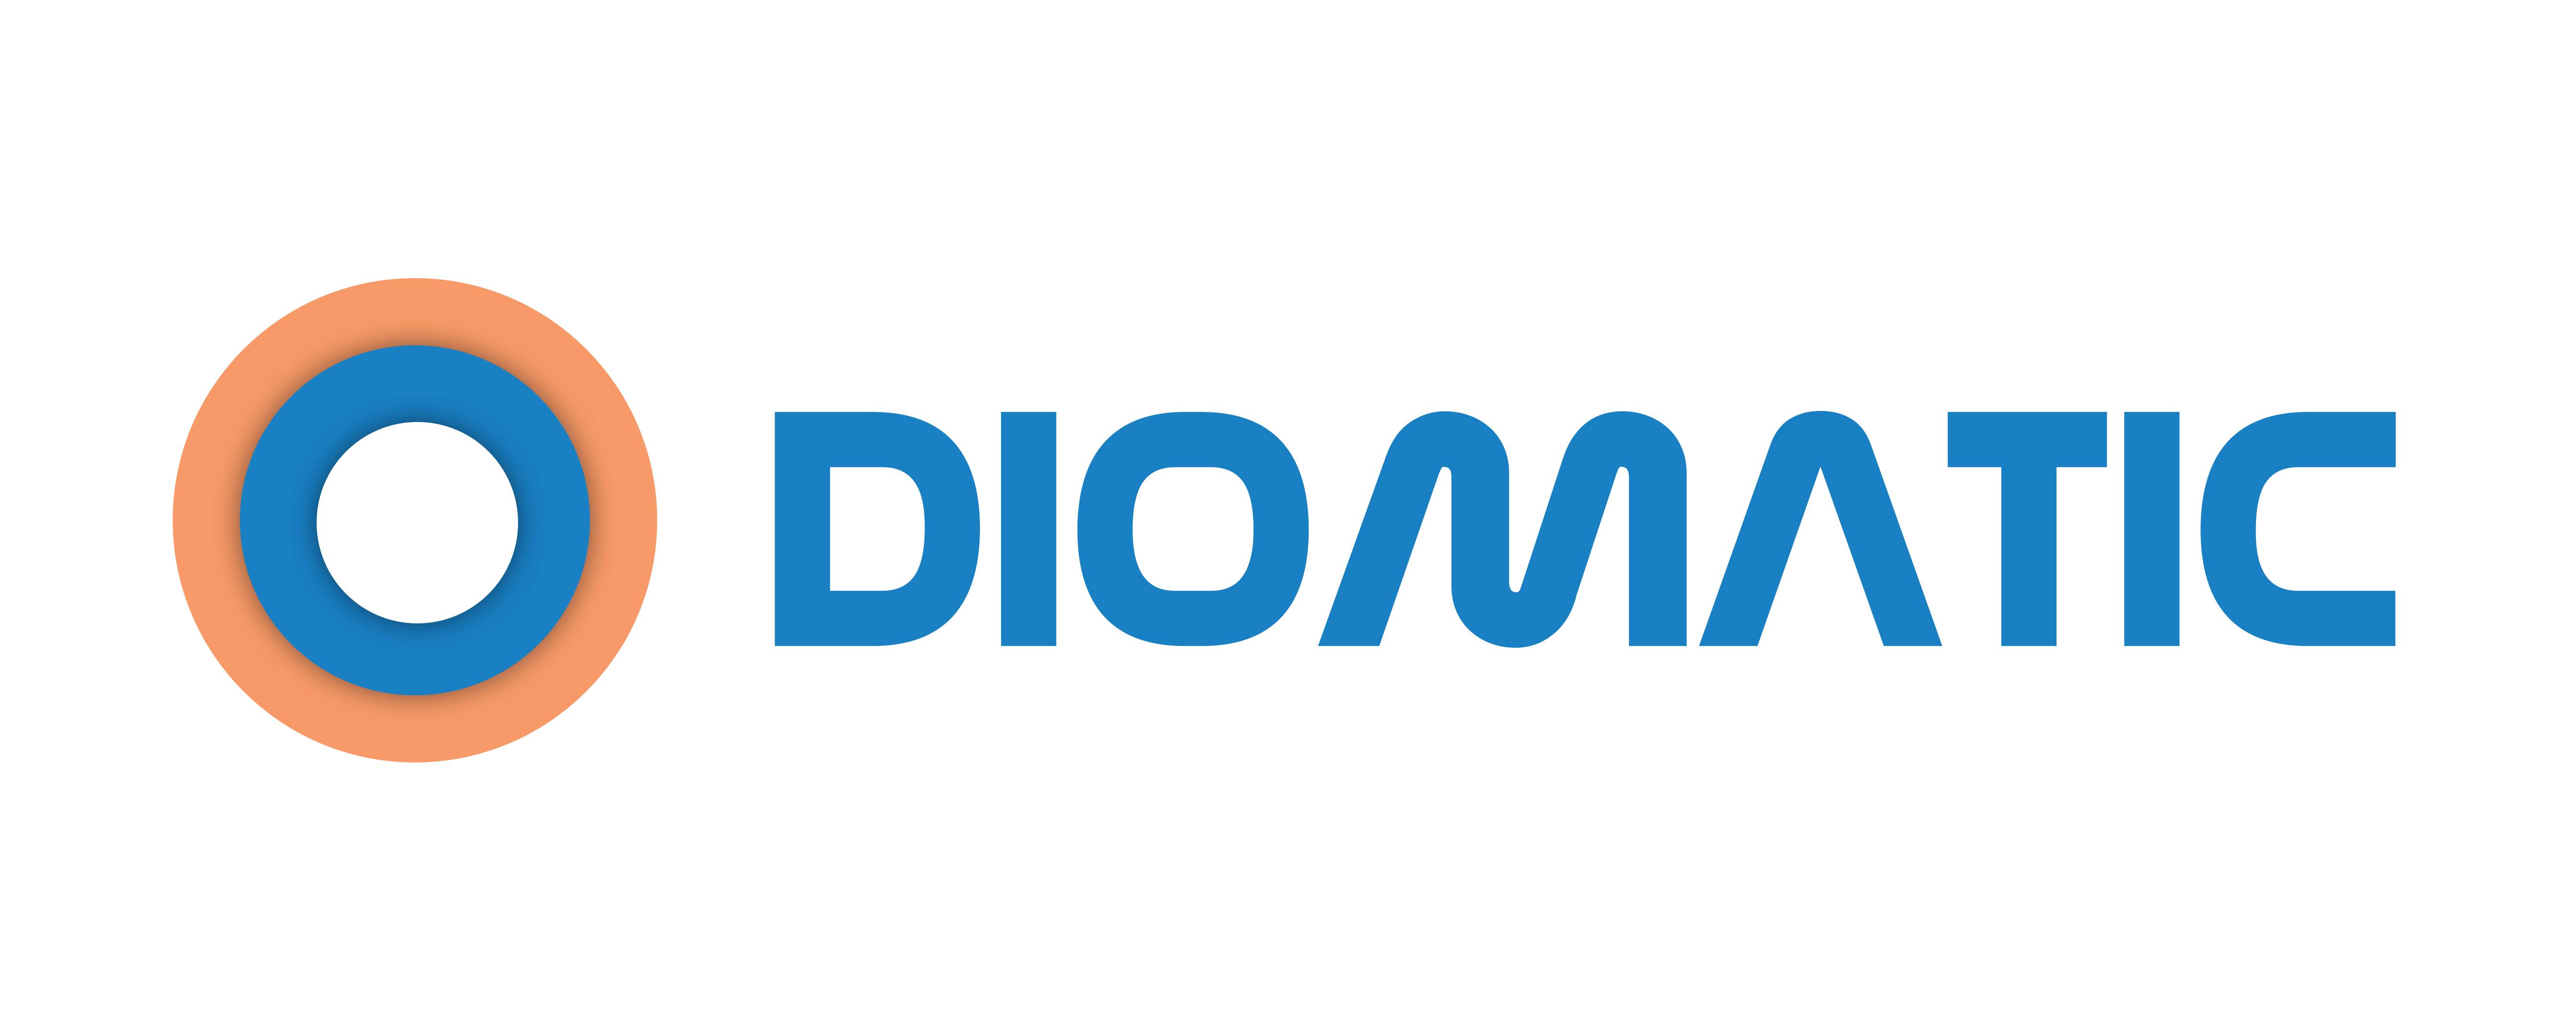 Diomatic